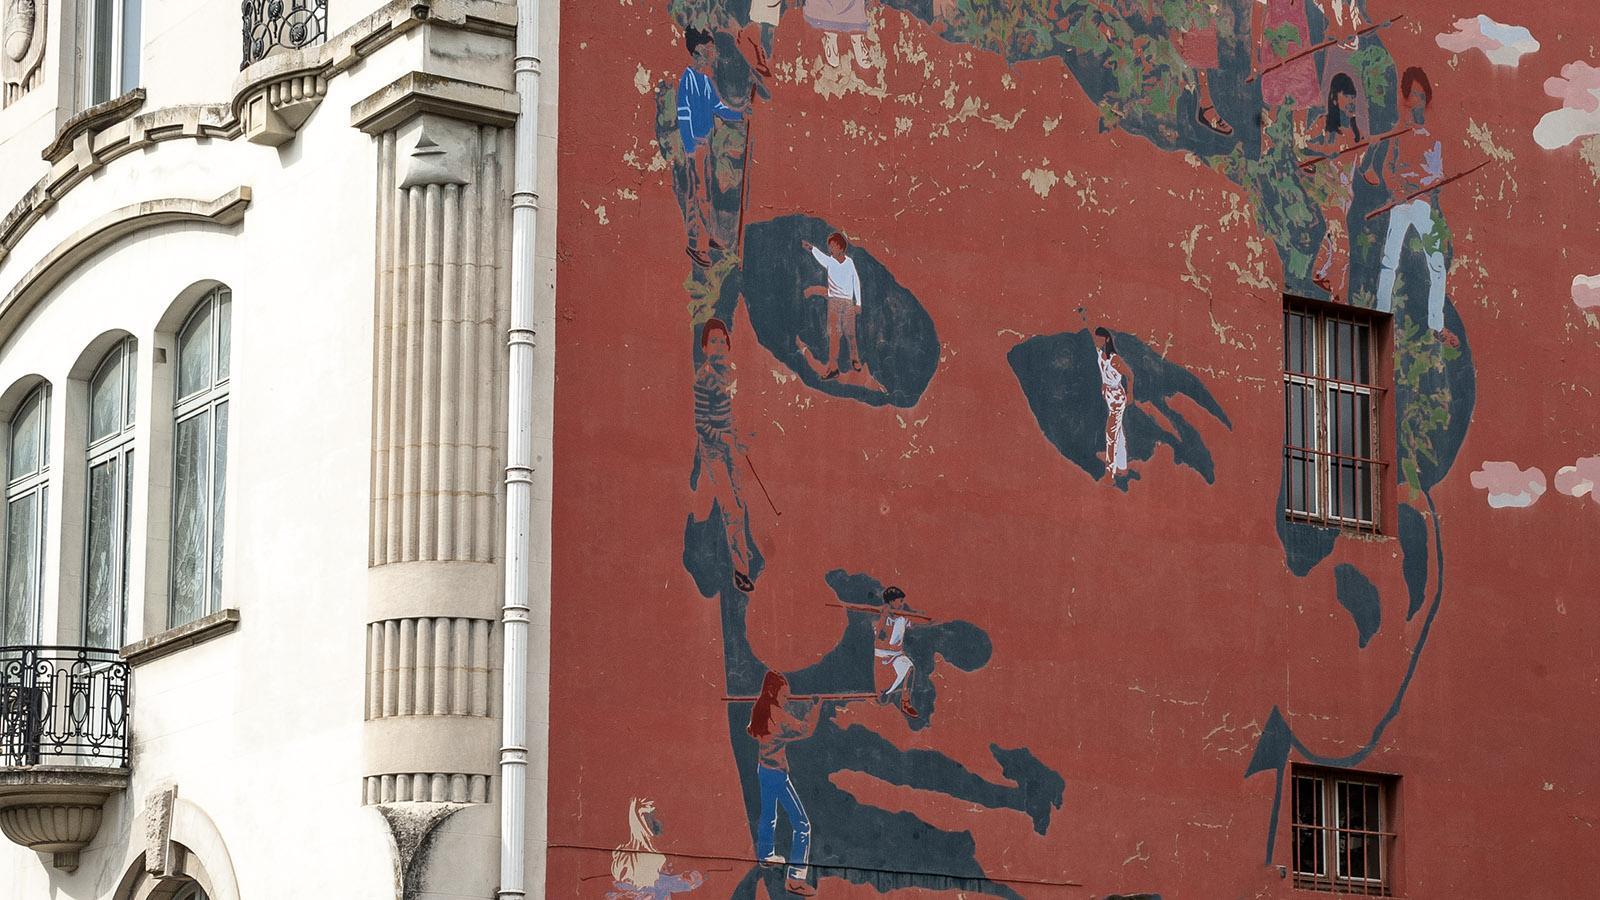 Valence, Fassade, Wandbild. Foto: Hilke Maunder